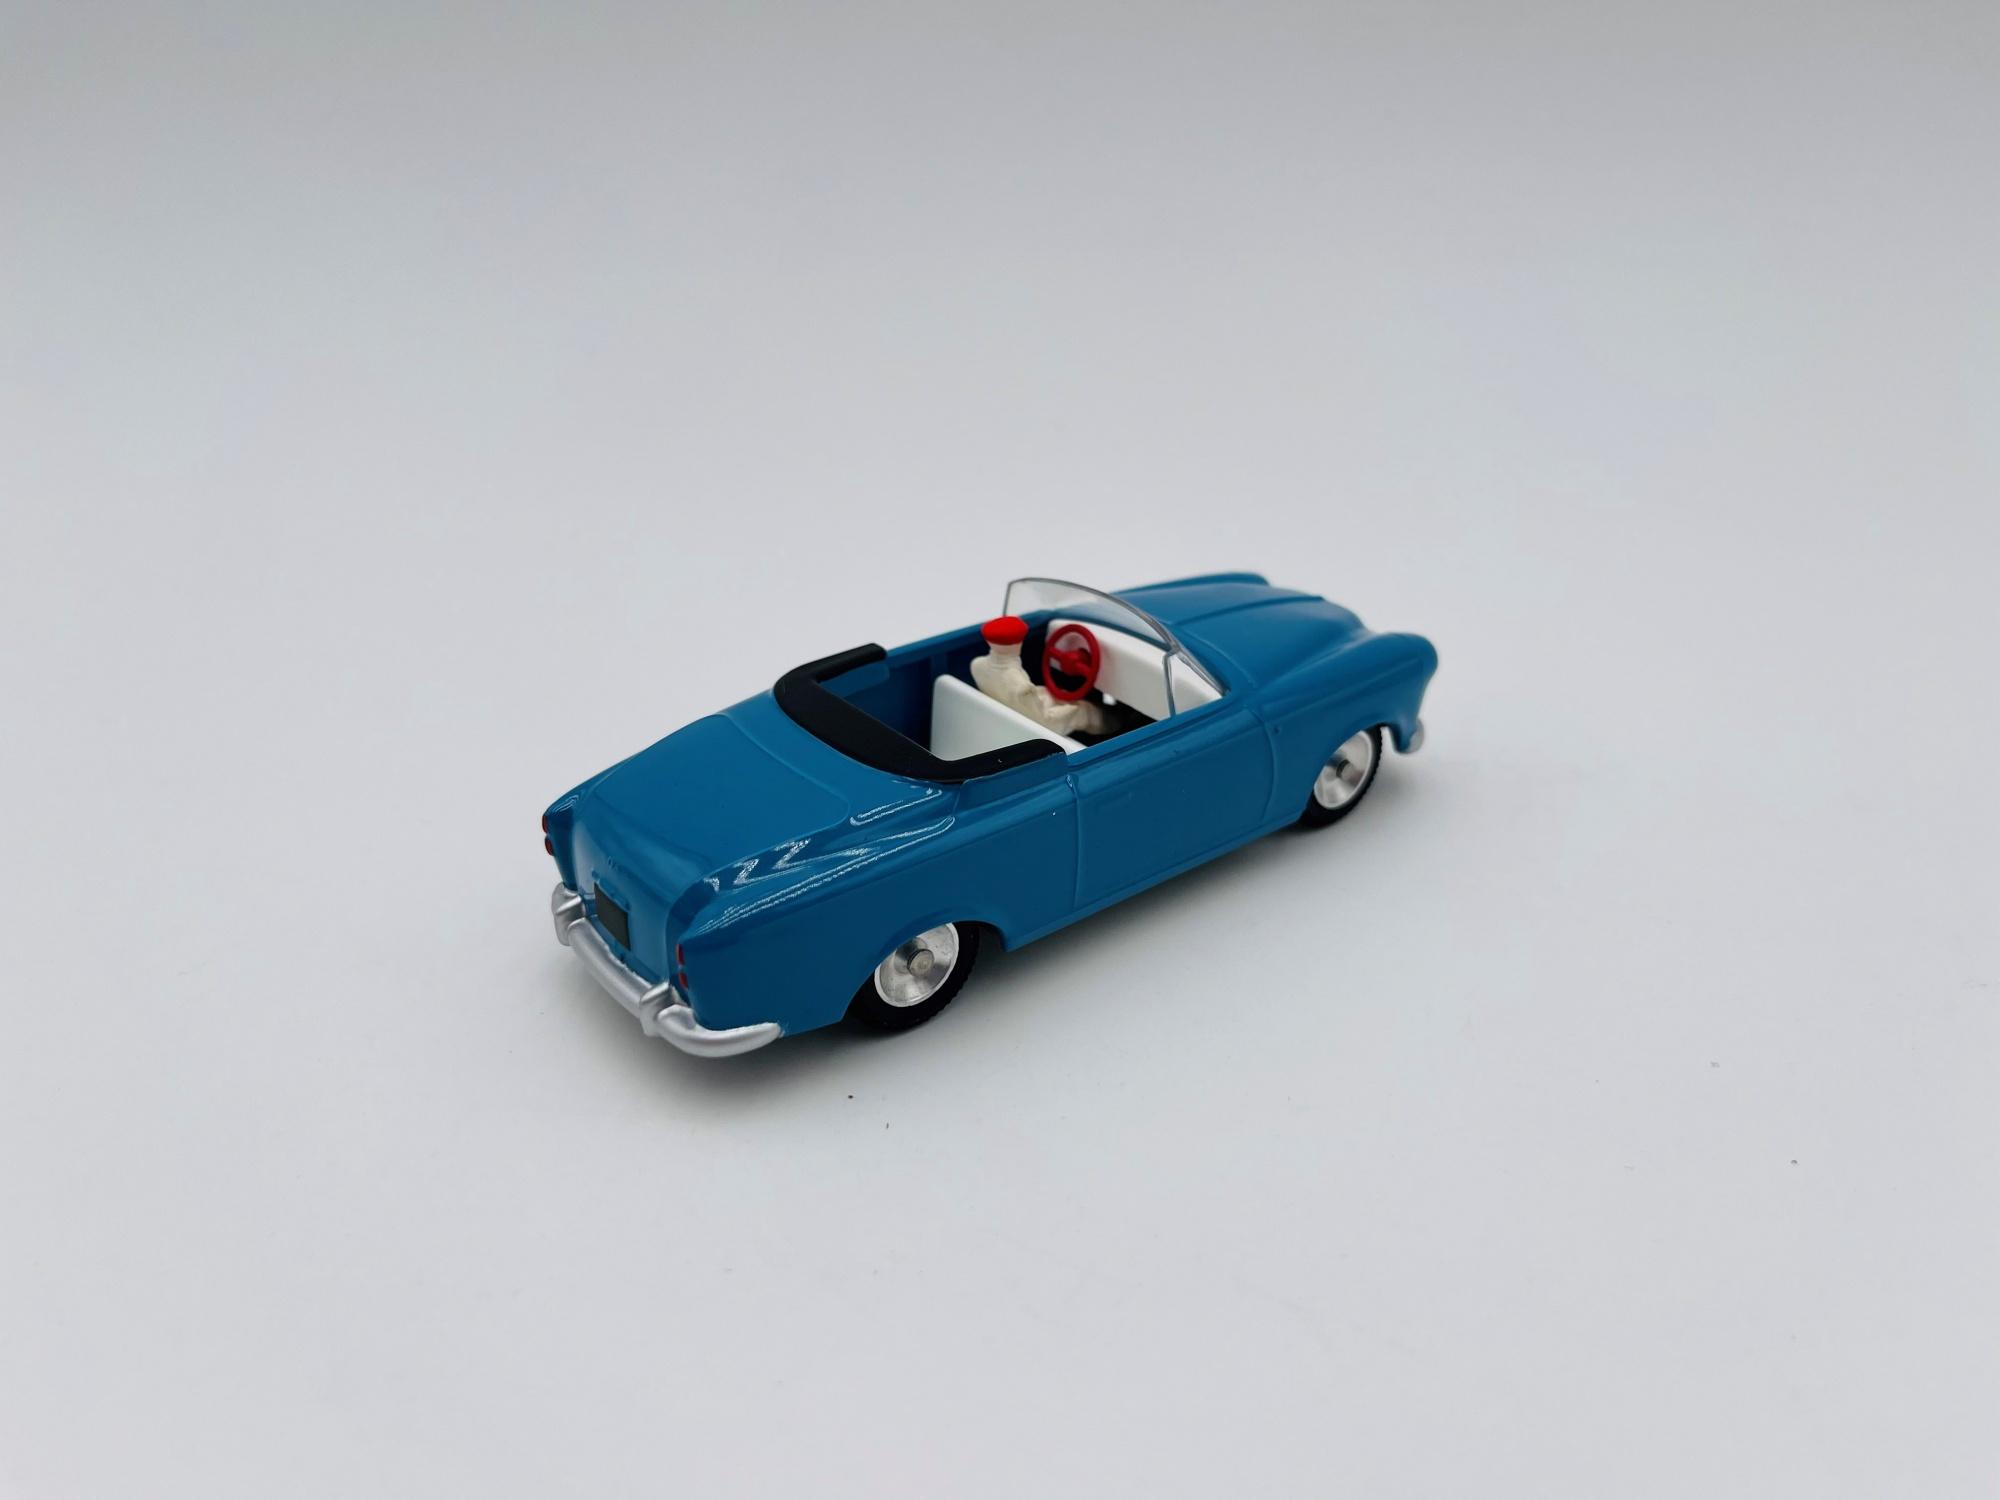 Peugeot 403 cabriolet Bleu Clair